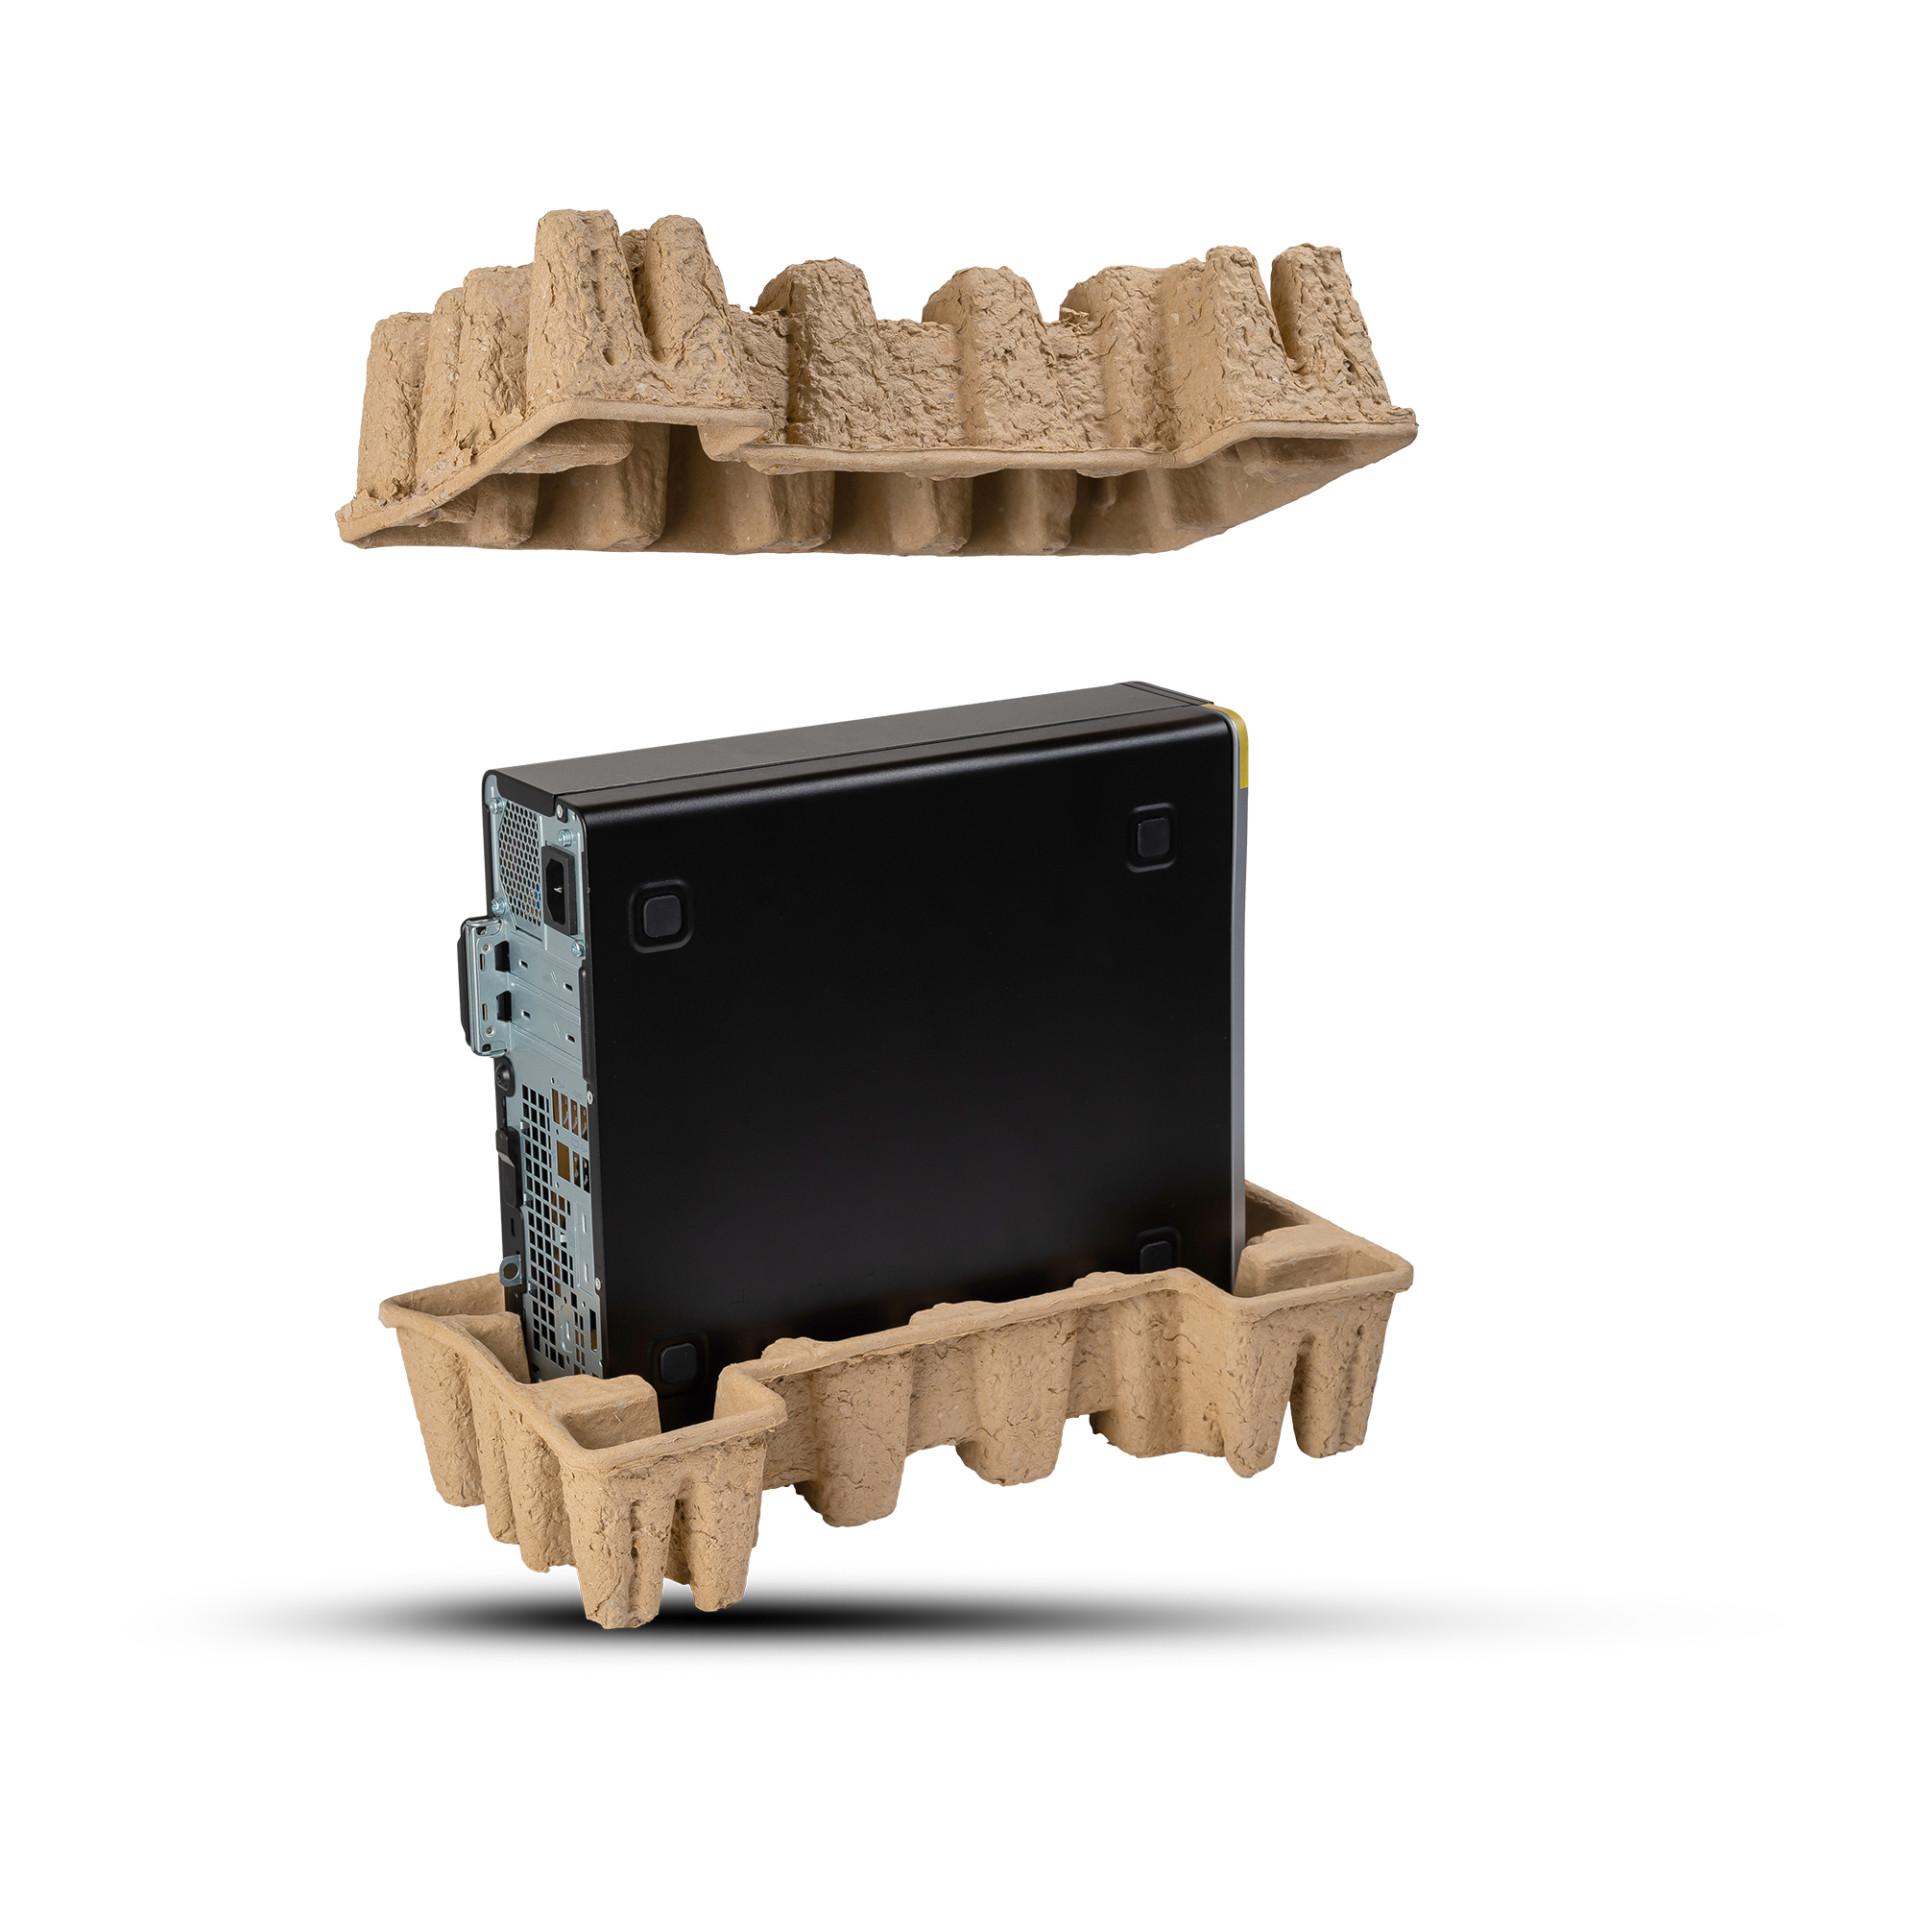 Pulp-Tec Faserguss Computerverpackung